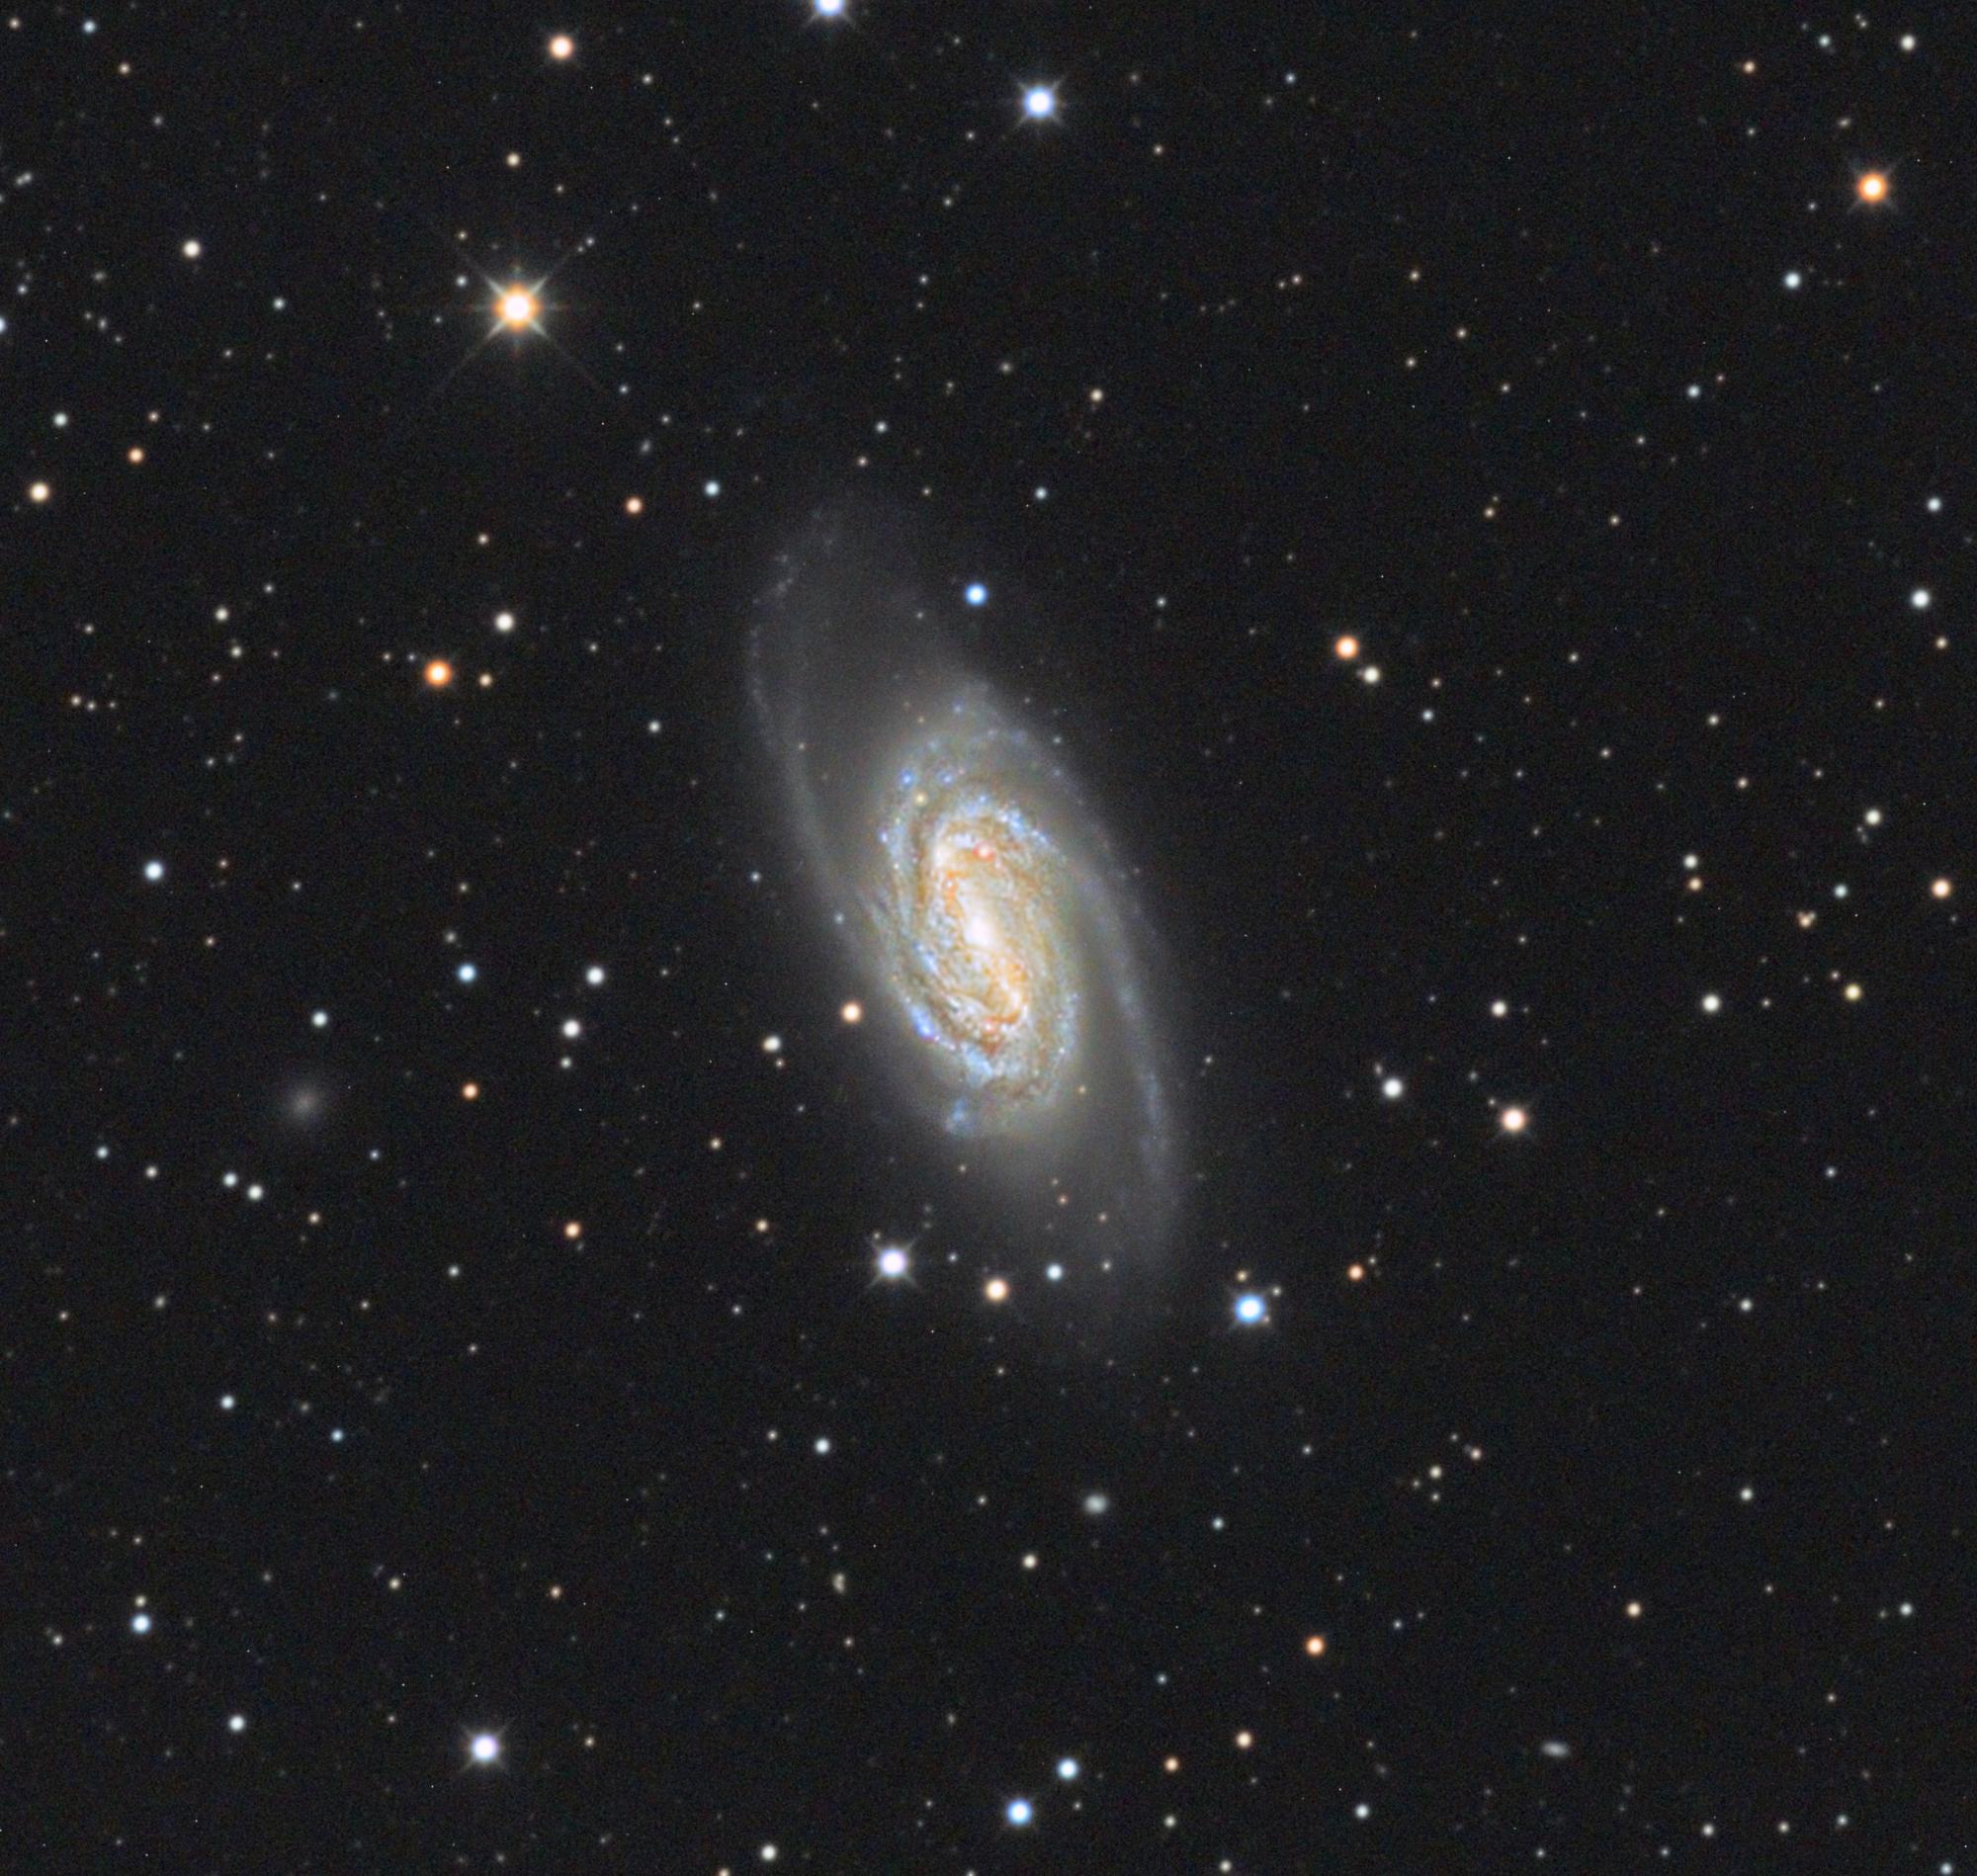 f:id:snct-astro:20210313100632j:plain